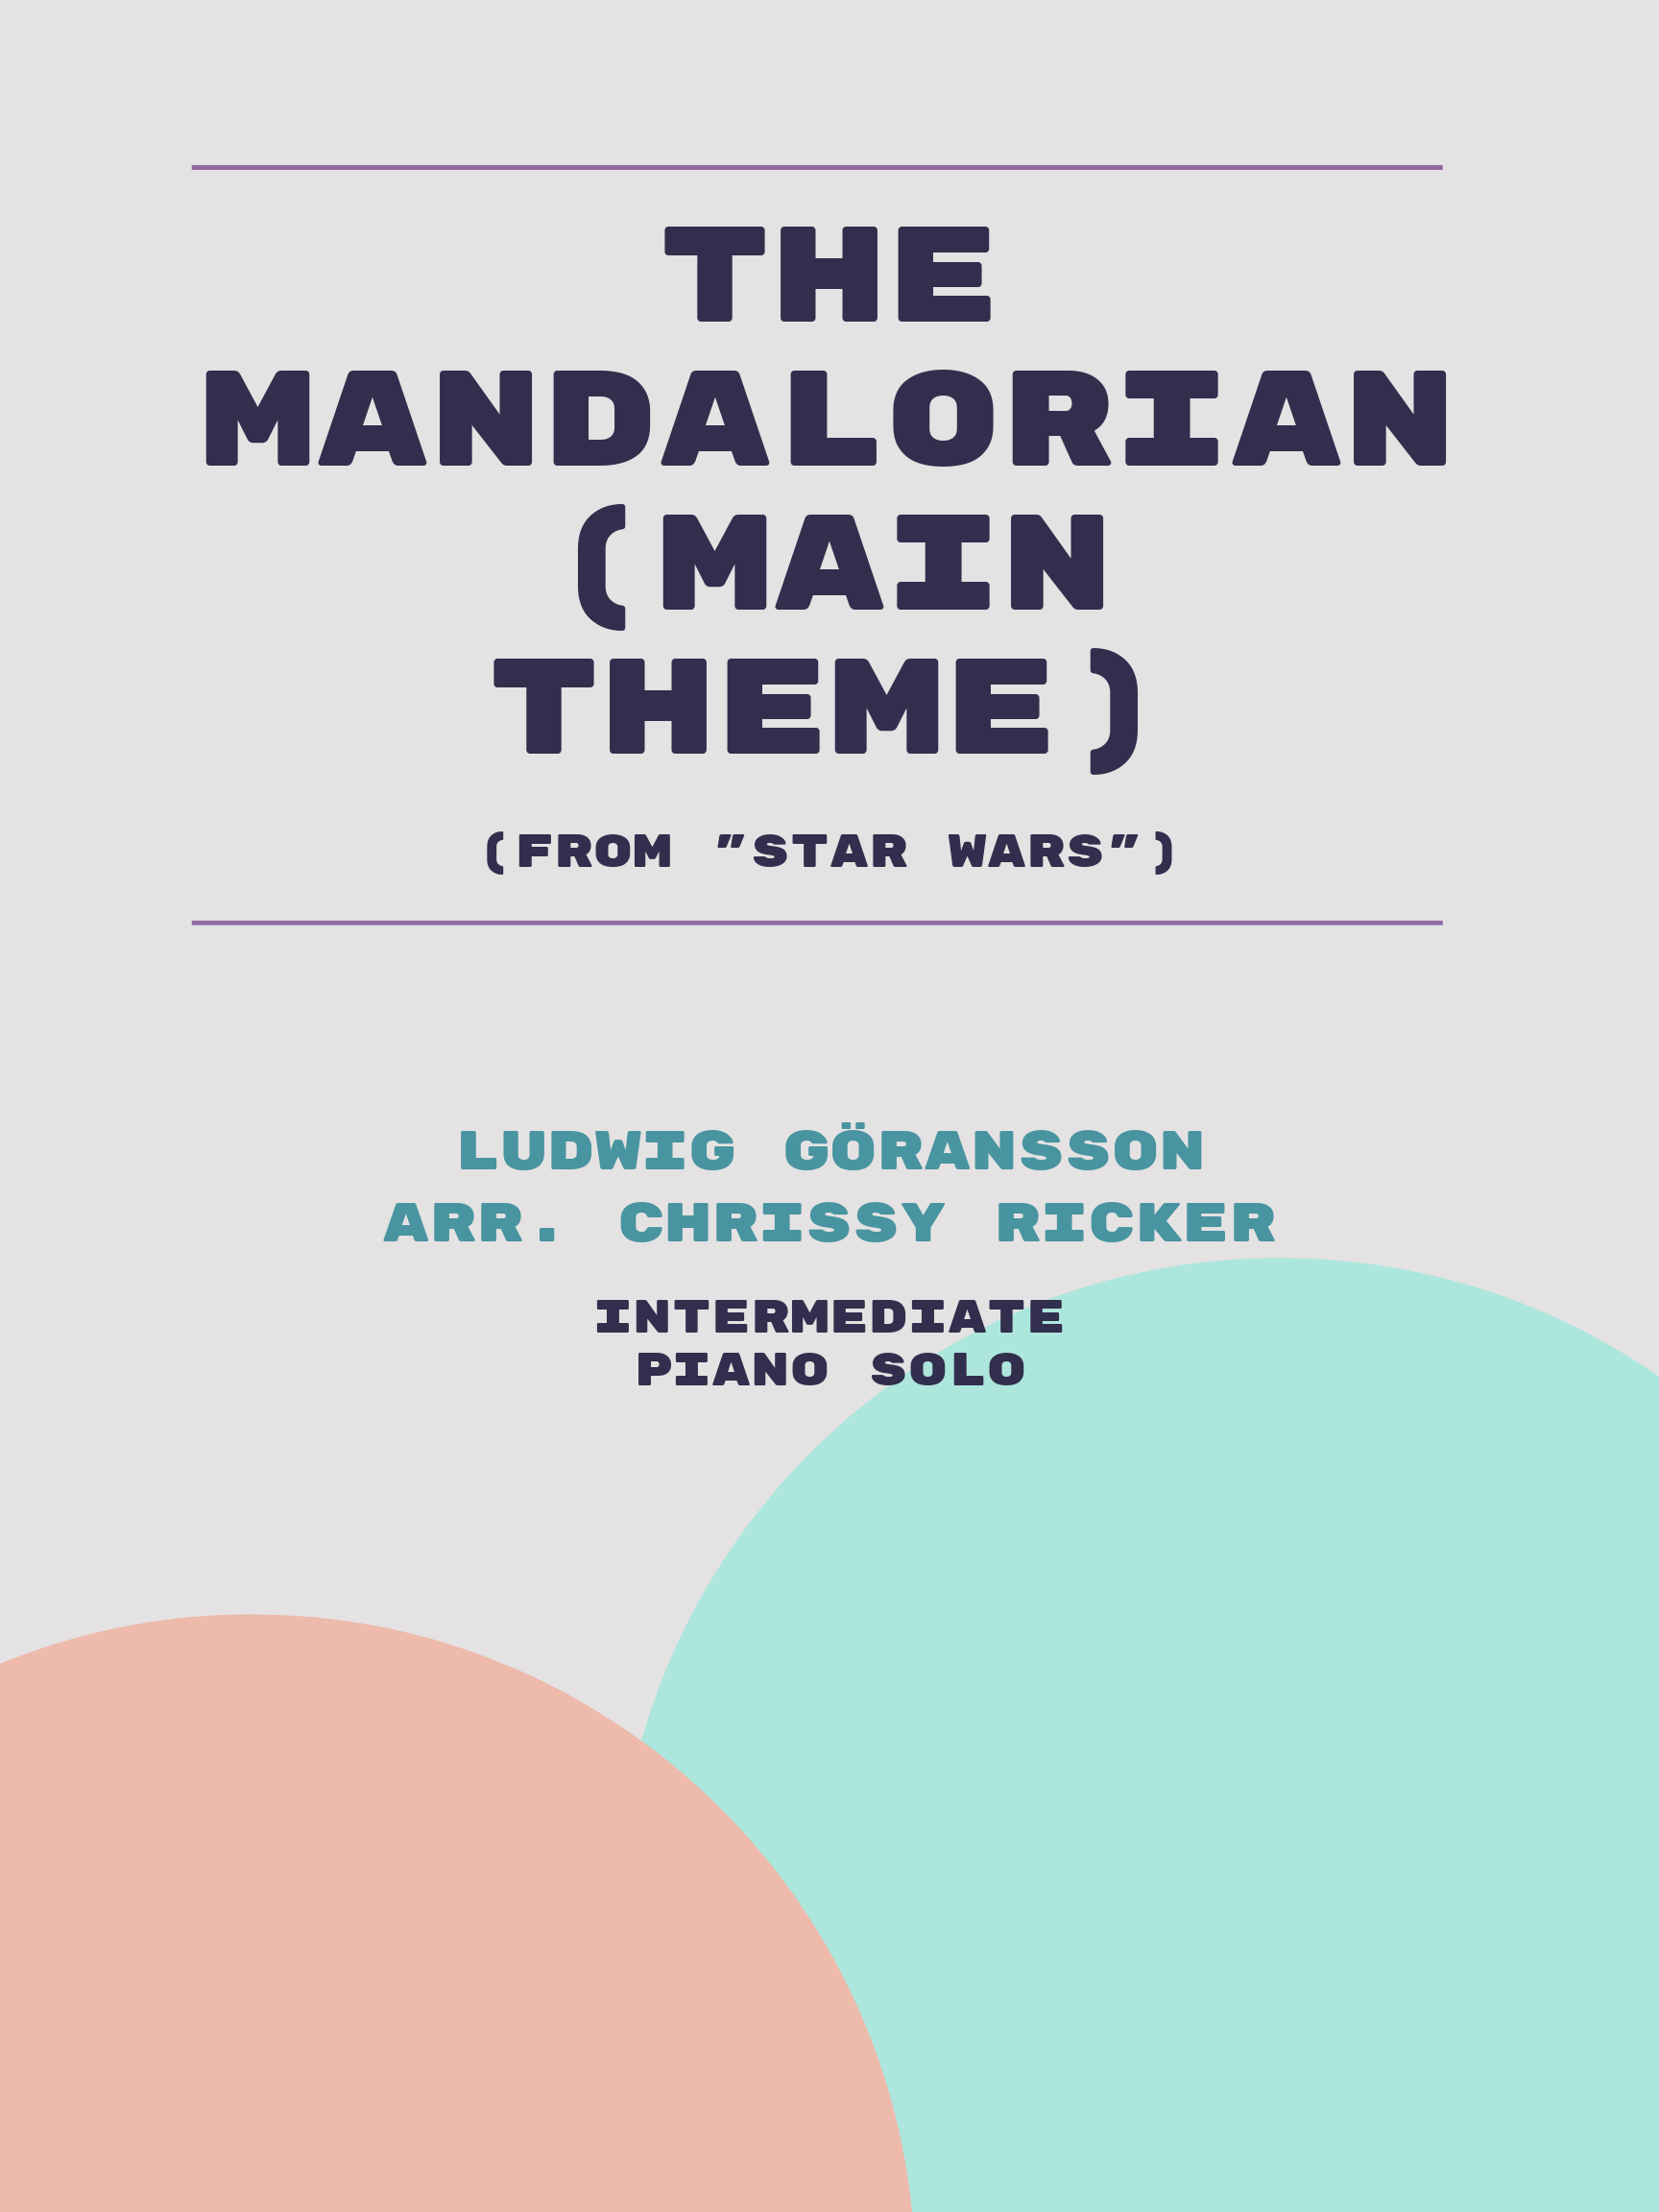 The Mandalorian (Main Theme) by Ludwig Göransson